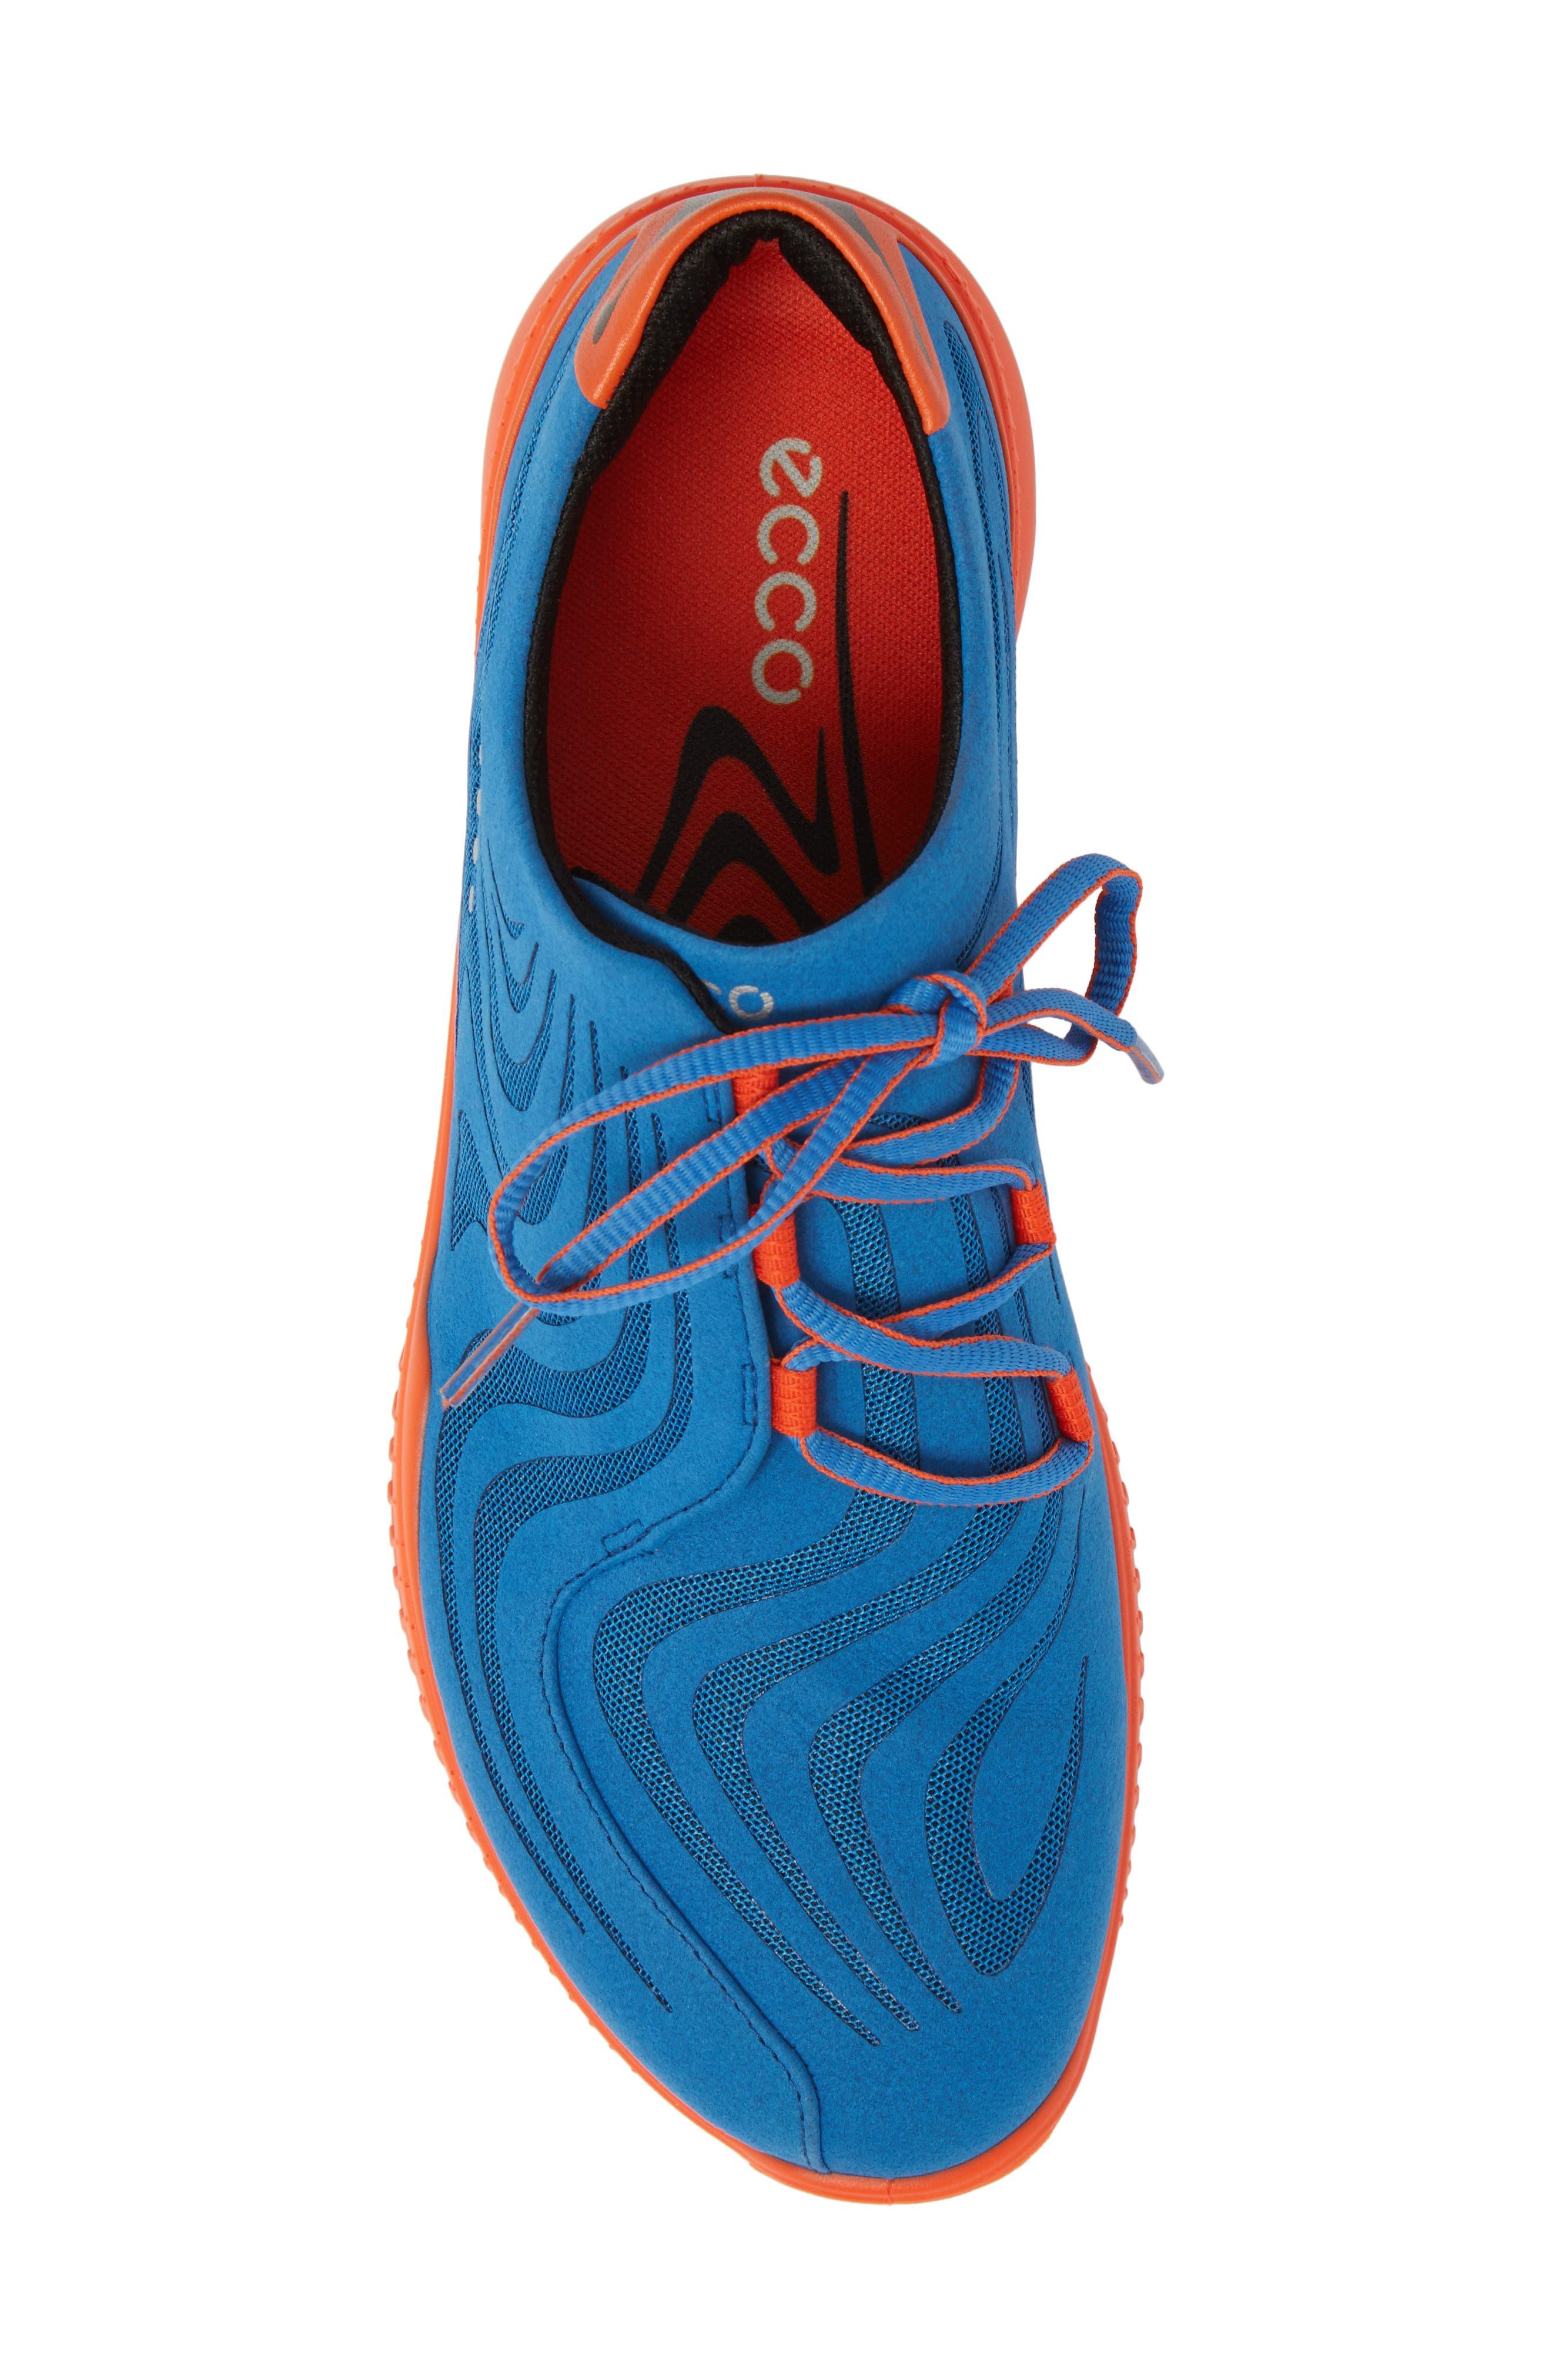 Golf S-Drive Water Resistant Shoe,                             Alternate thumbnail 5, color,                             Bermuda Blue Leather